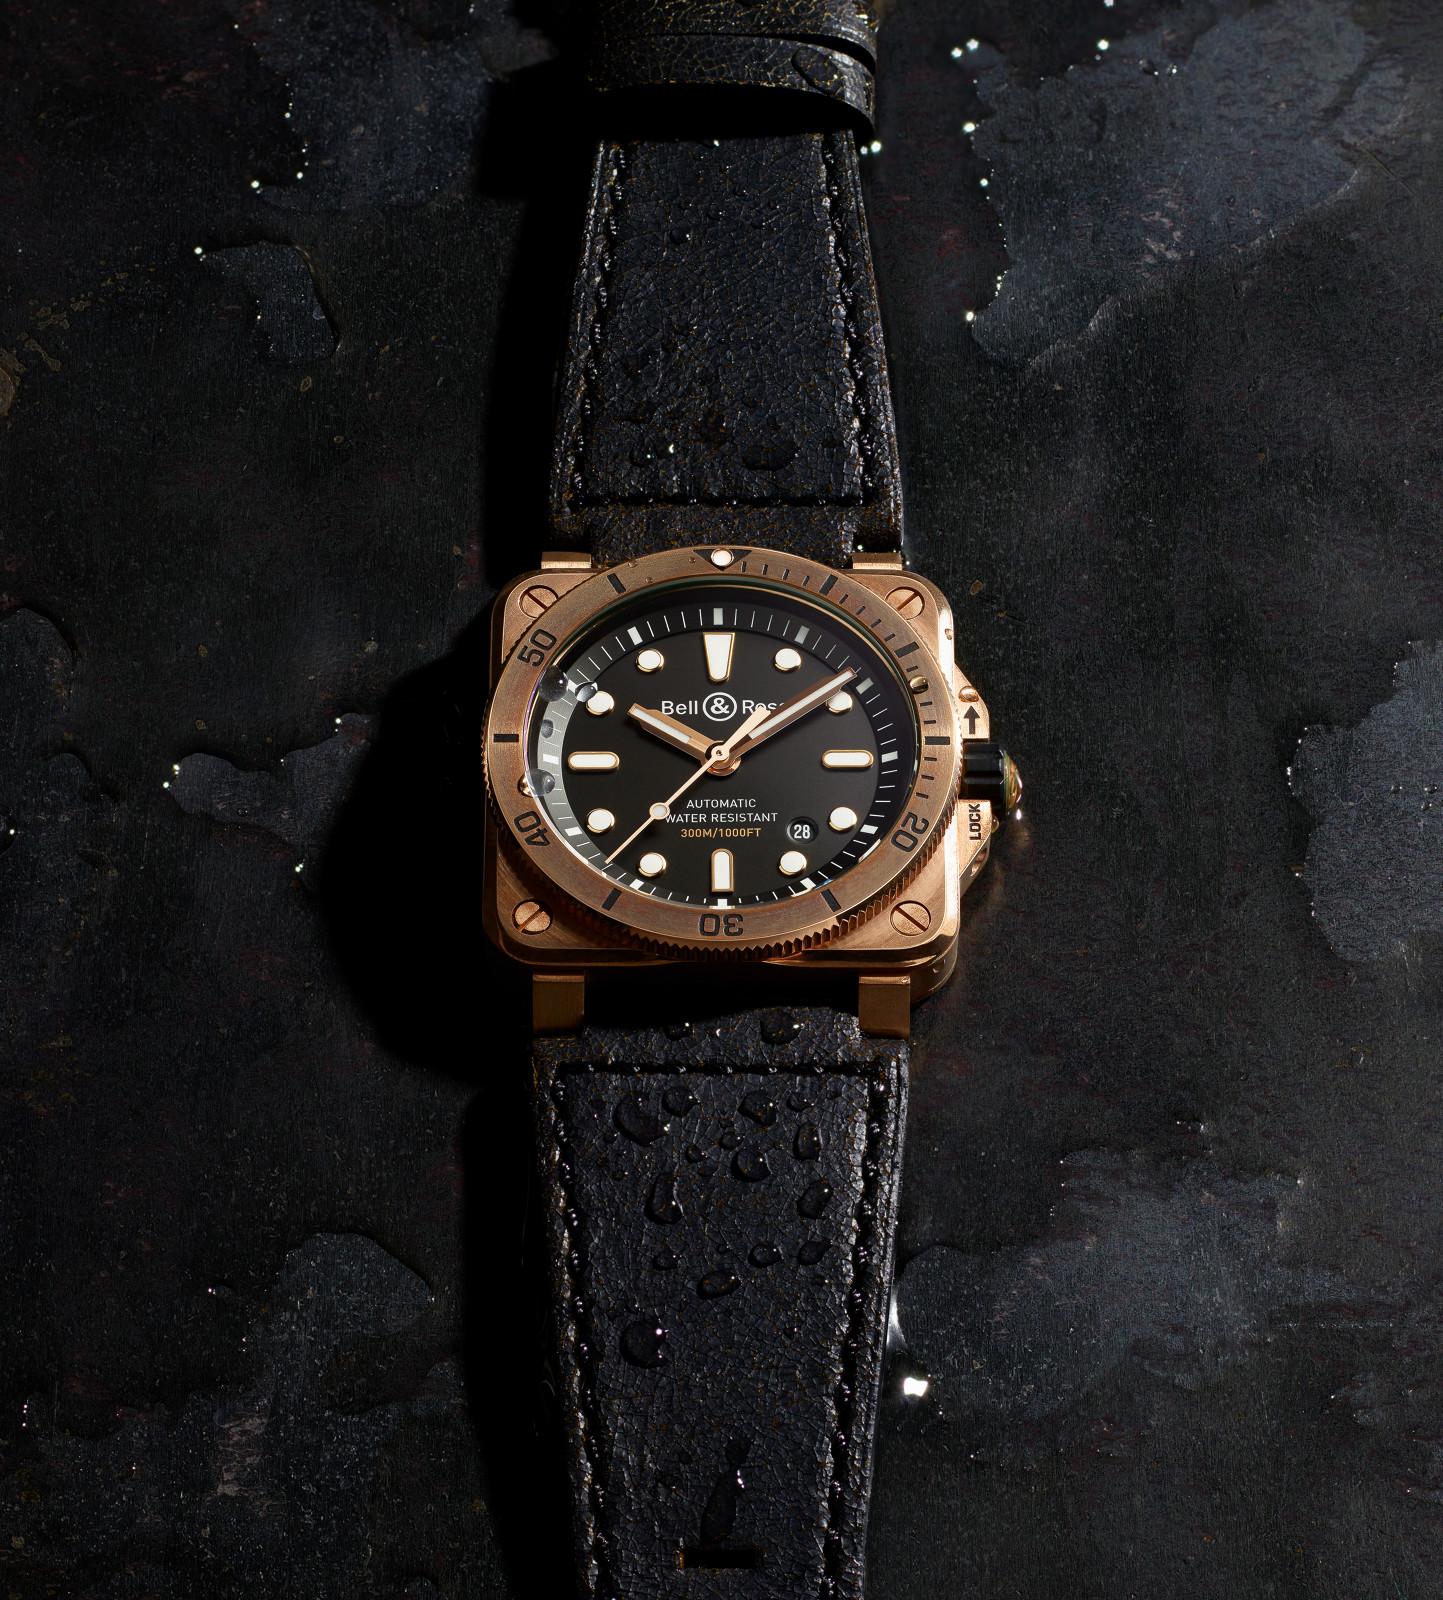 Bell & Ross BR03-92 Diver in bronze